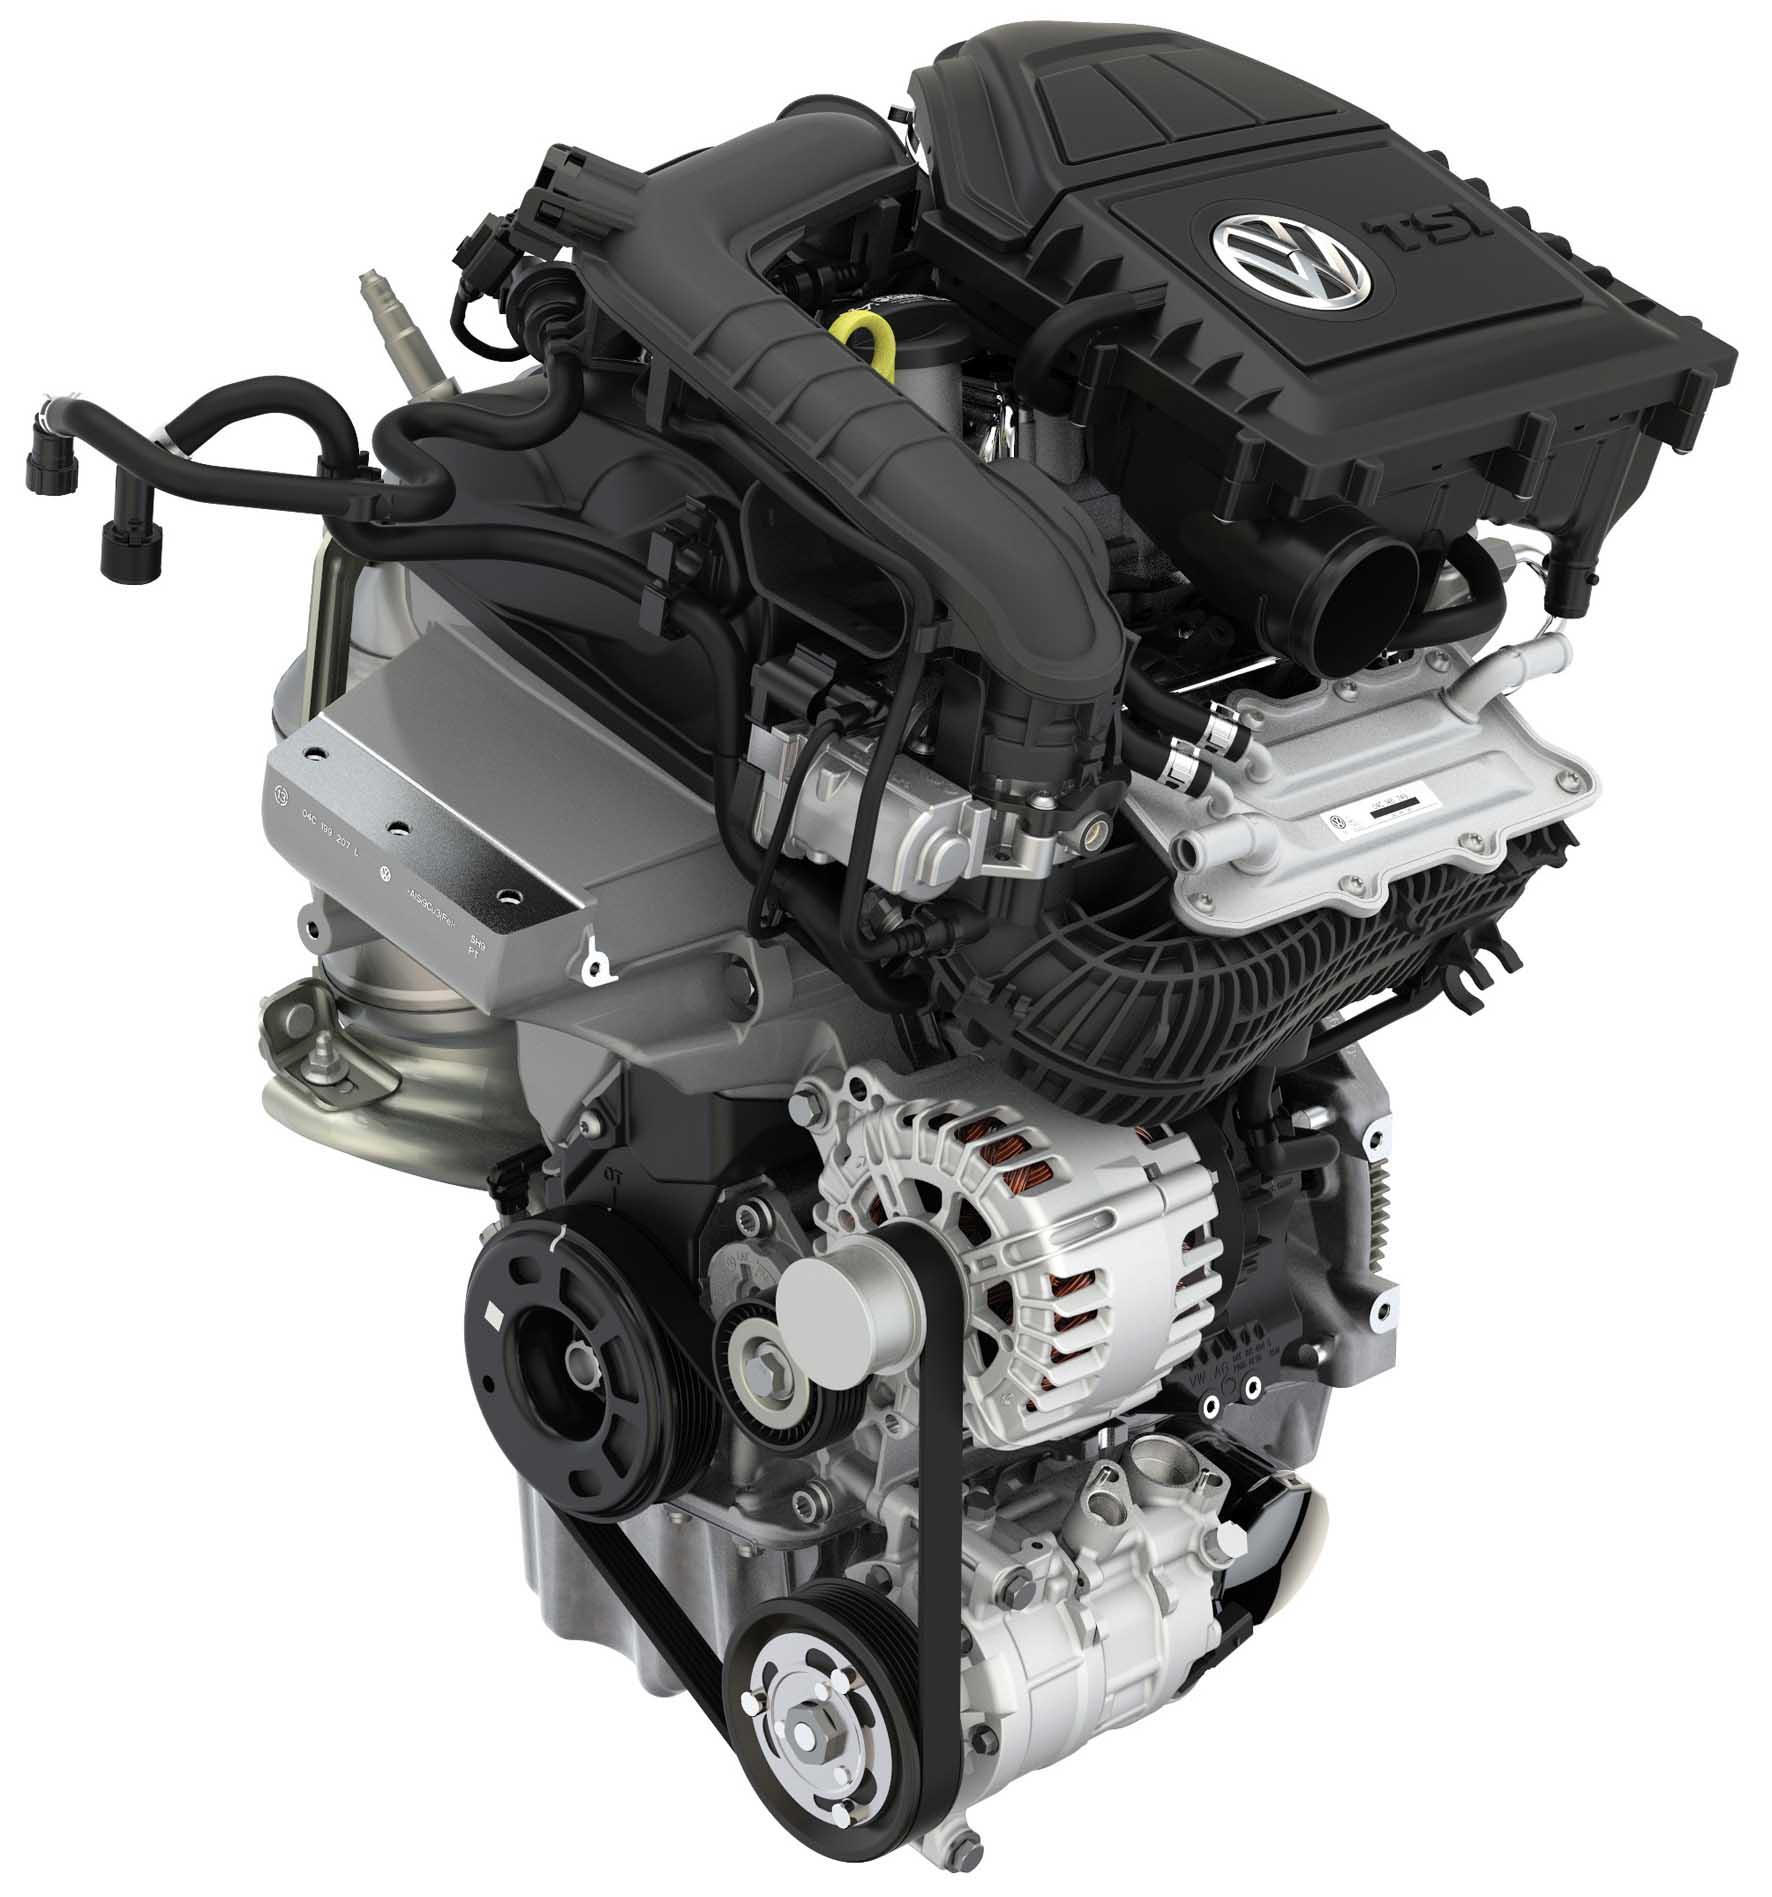 Vw Motore 1.0 TSI tre cilindri turbo 115 Cv